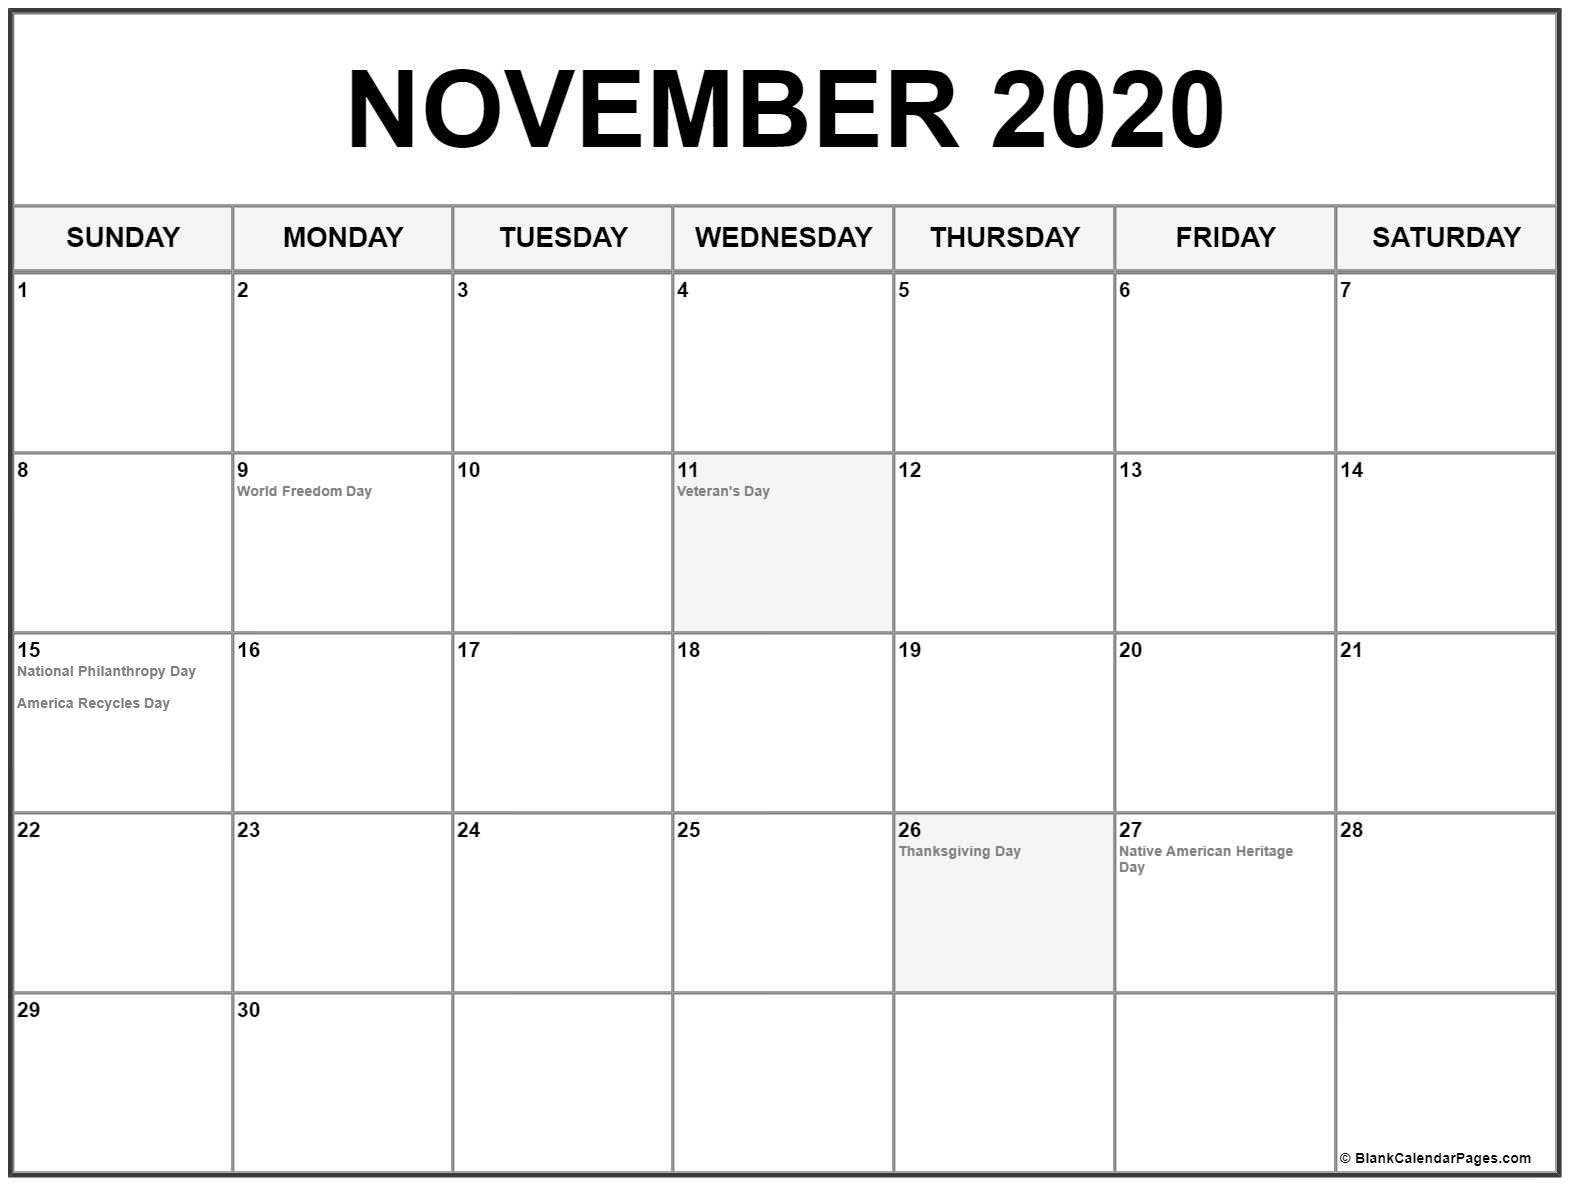 Free Printable 2020 Calendar With Holidays 8 - Crearphpnuke